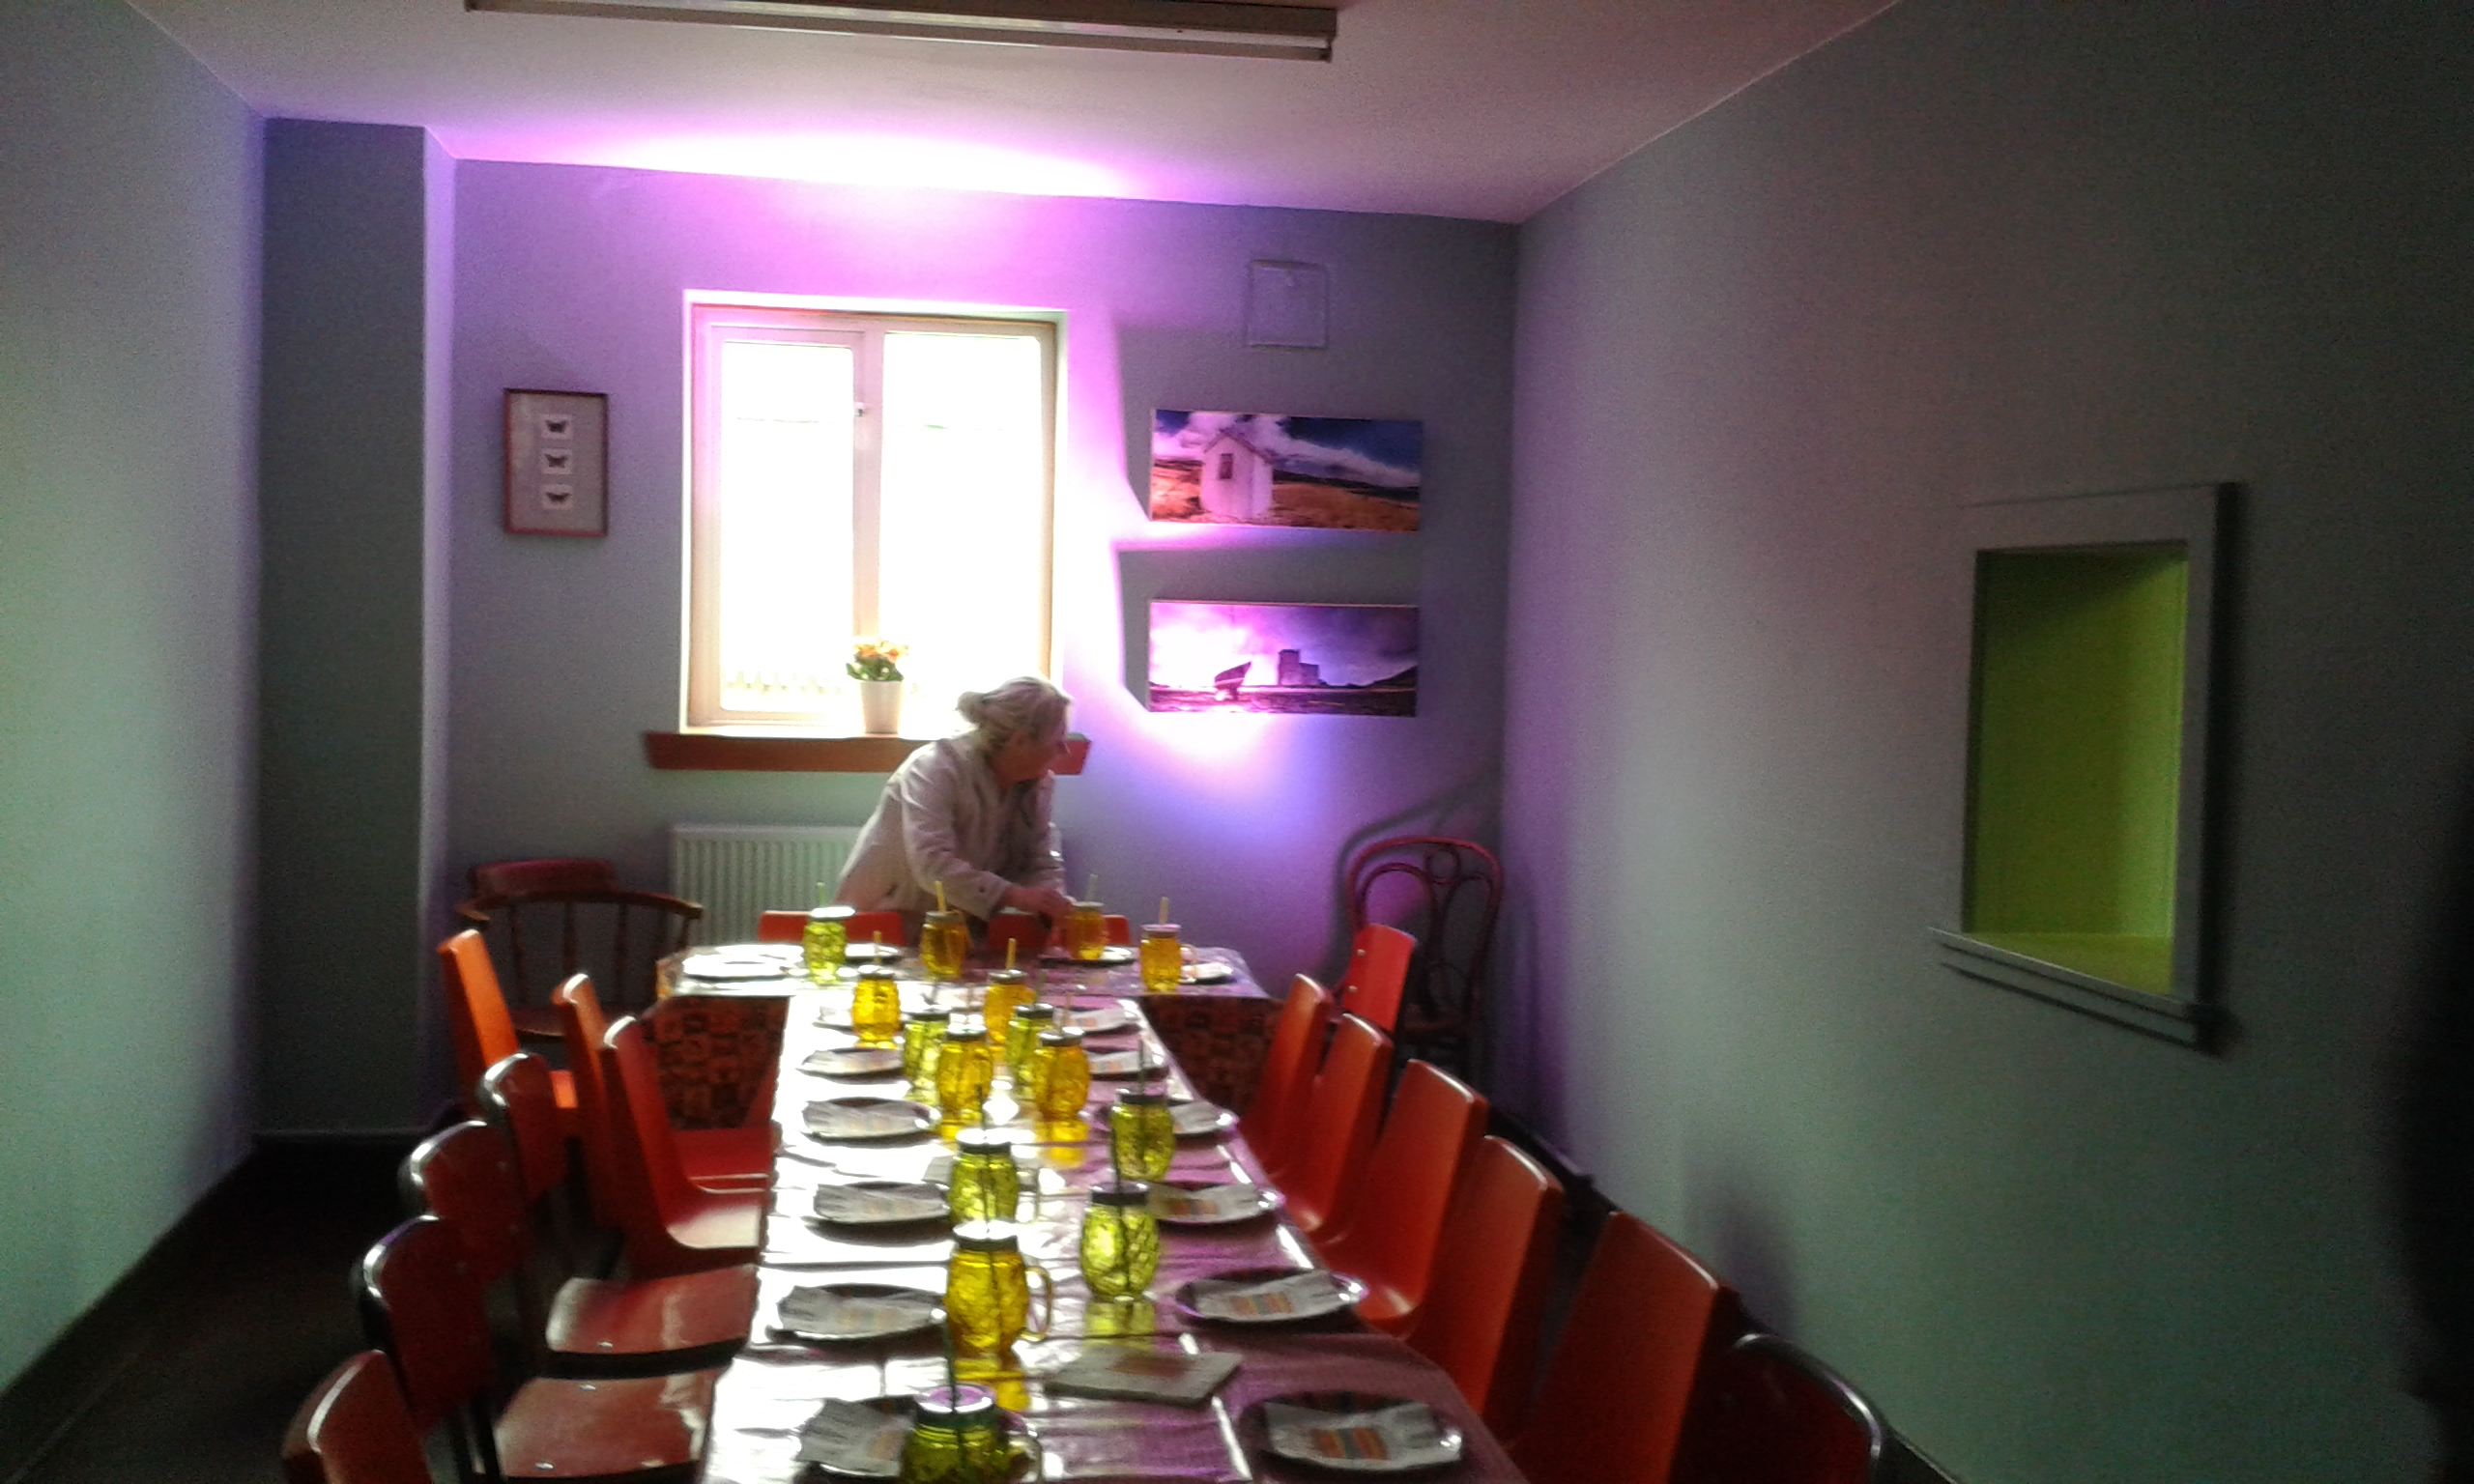 Lesser Hall set up for meal